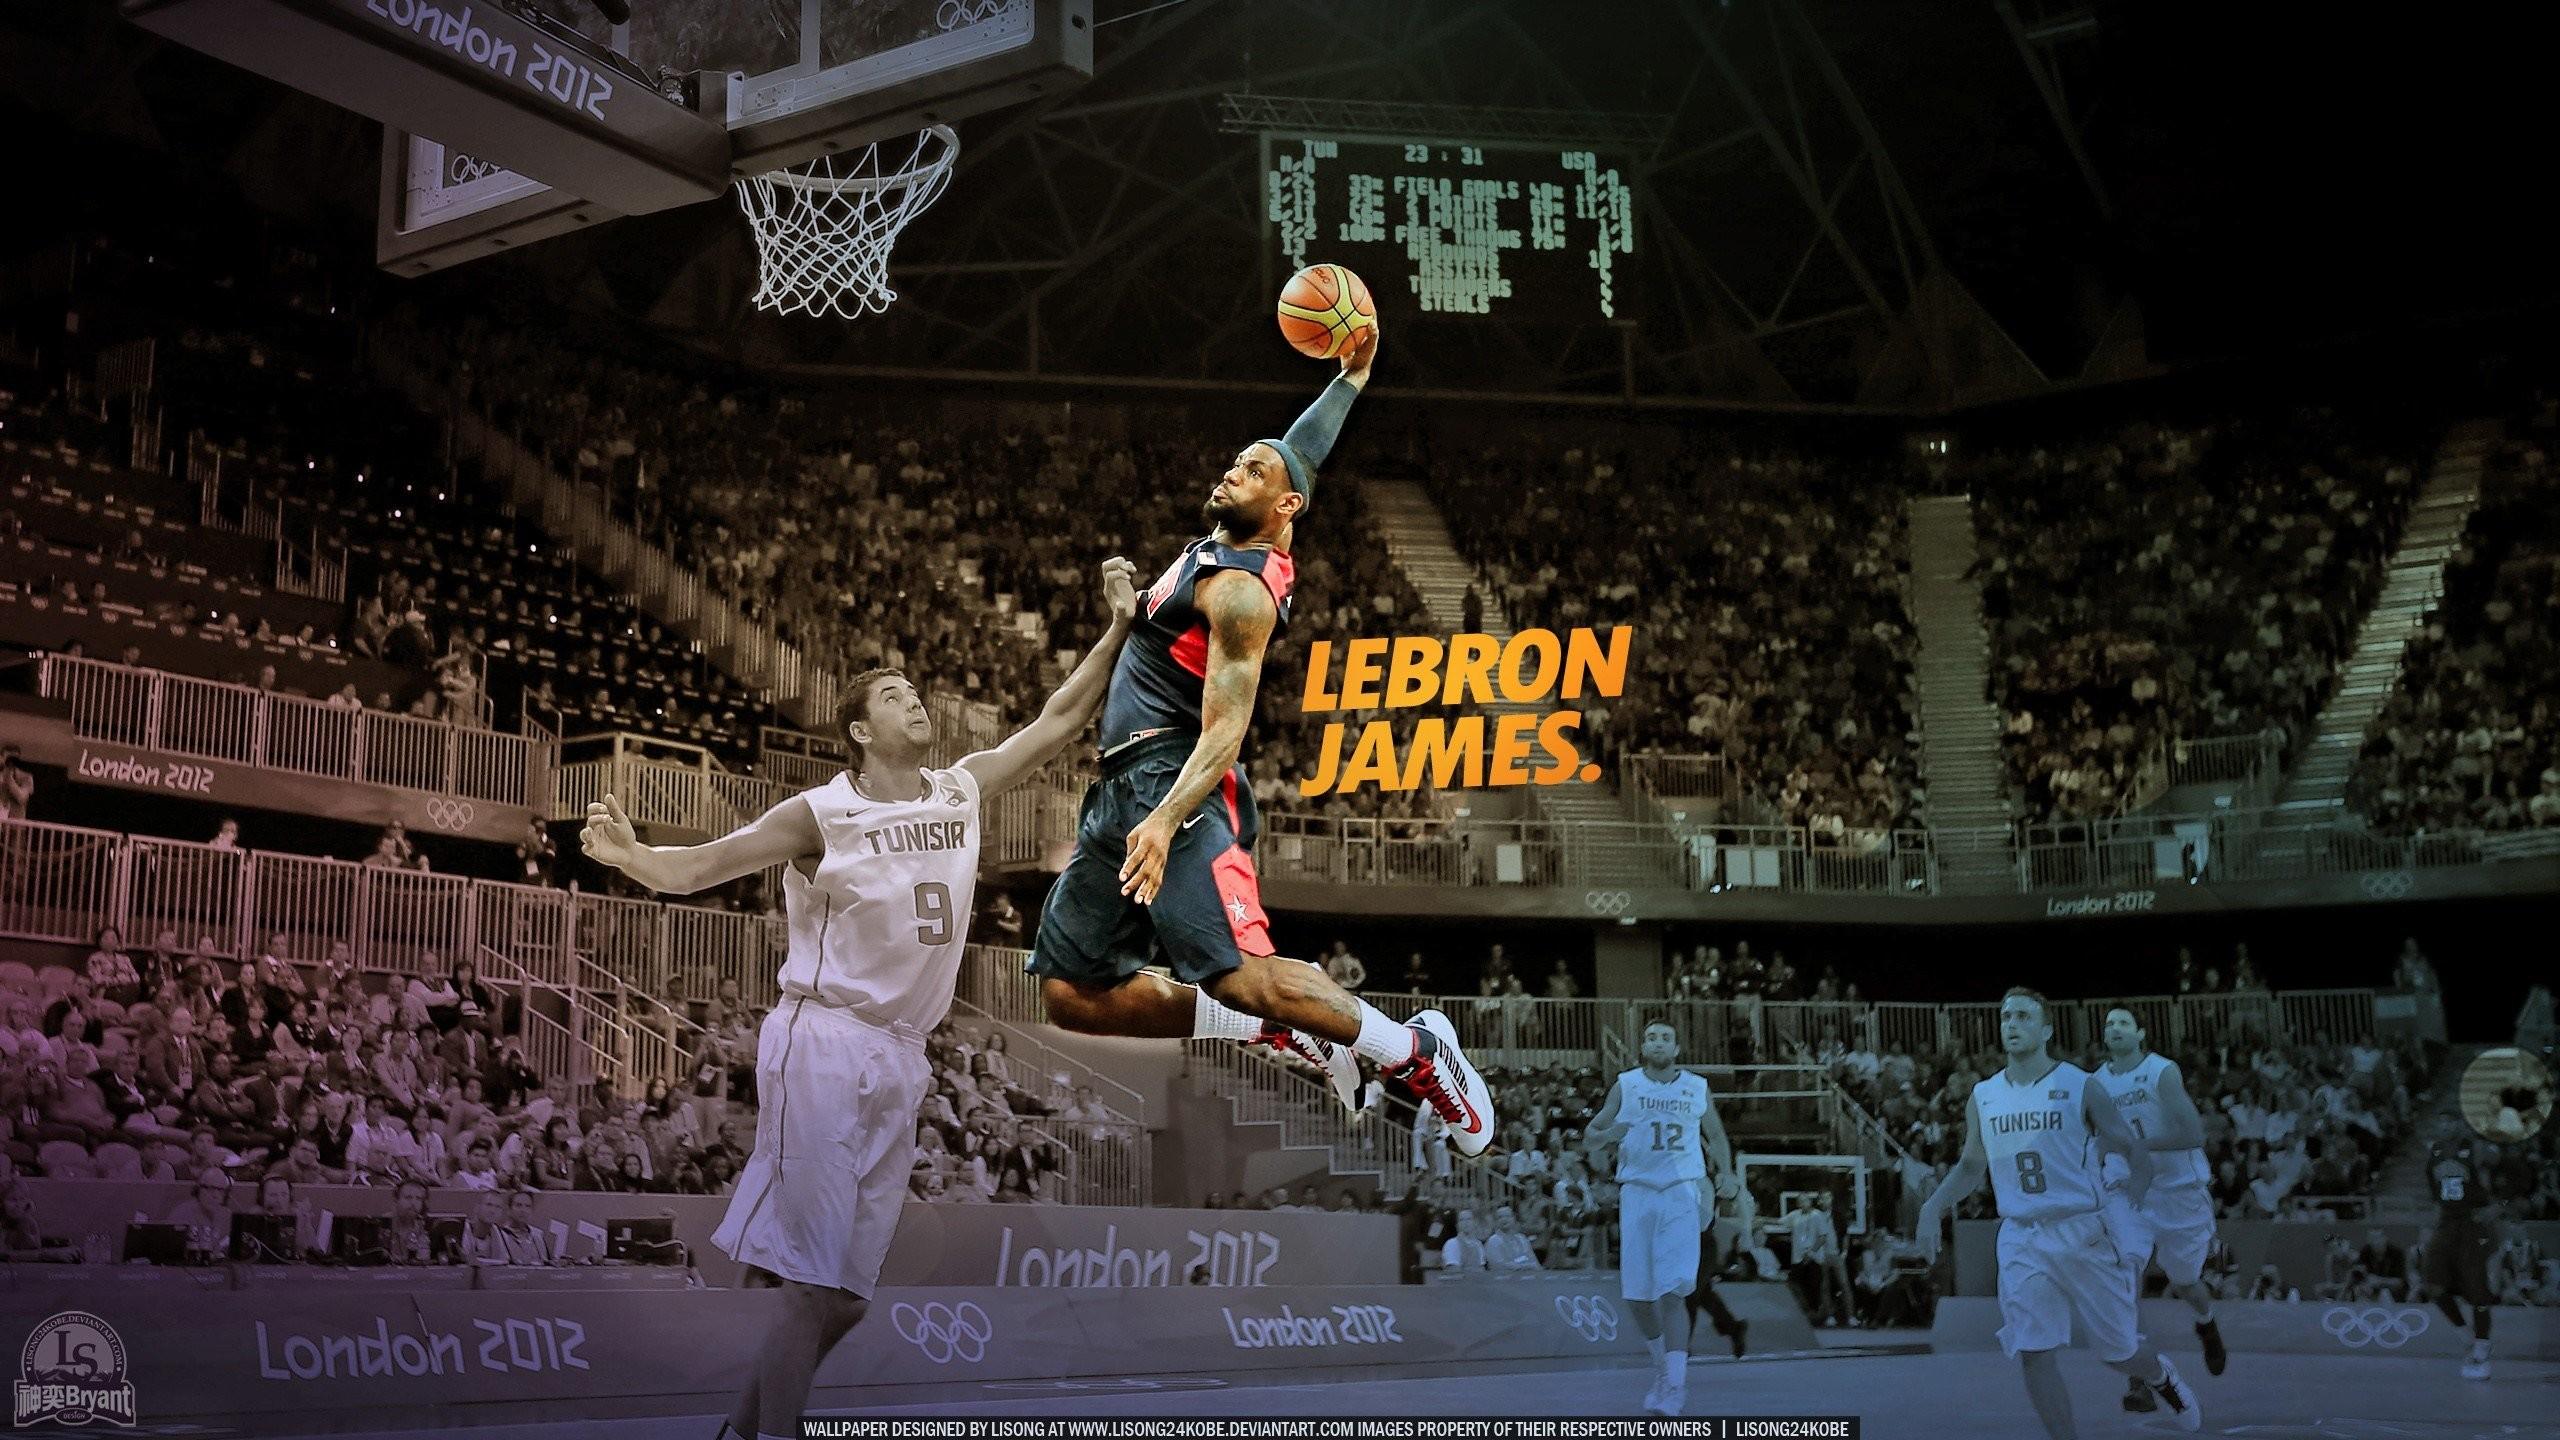 NBA Lebron James dunk basketball player wallpaper background